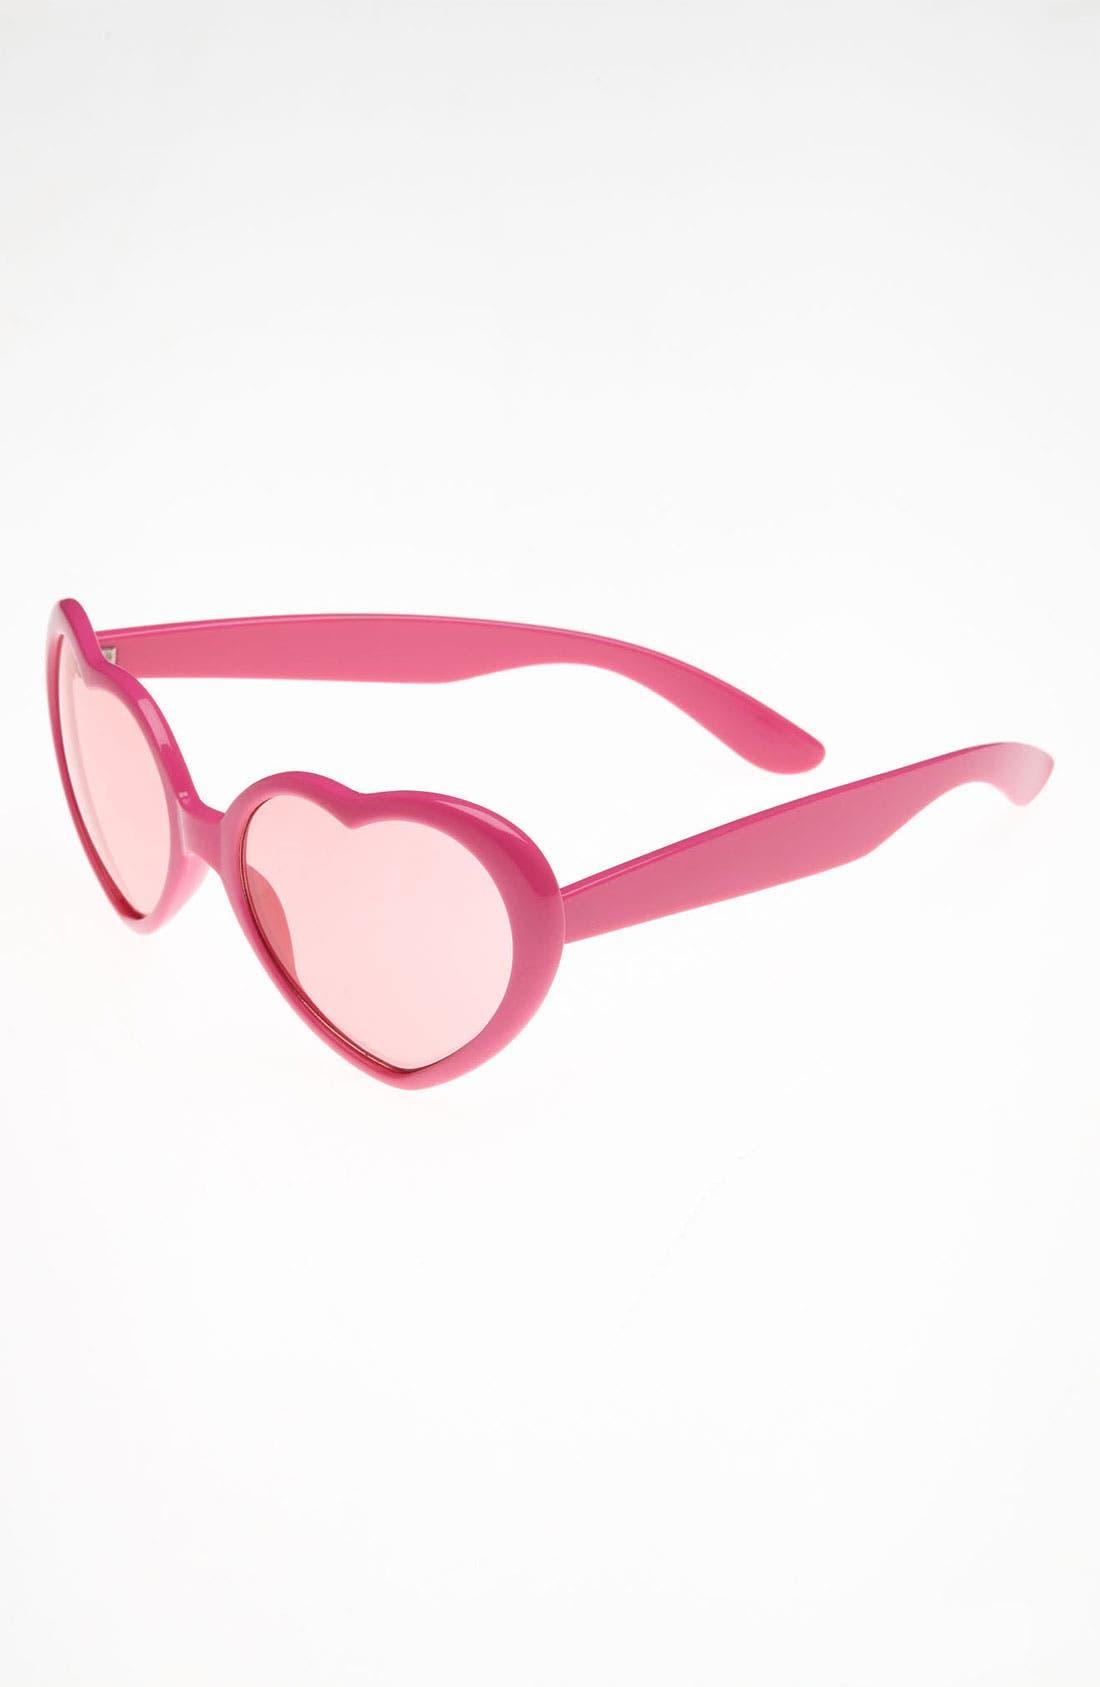 Main Image - Icon Eyewear Neon Sunglasses (Girls)